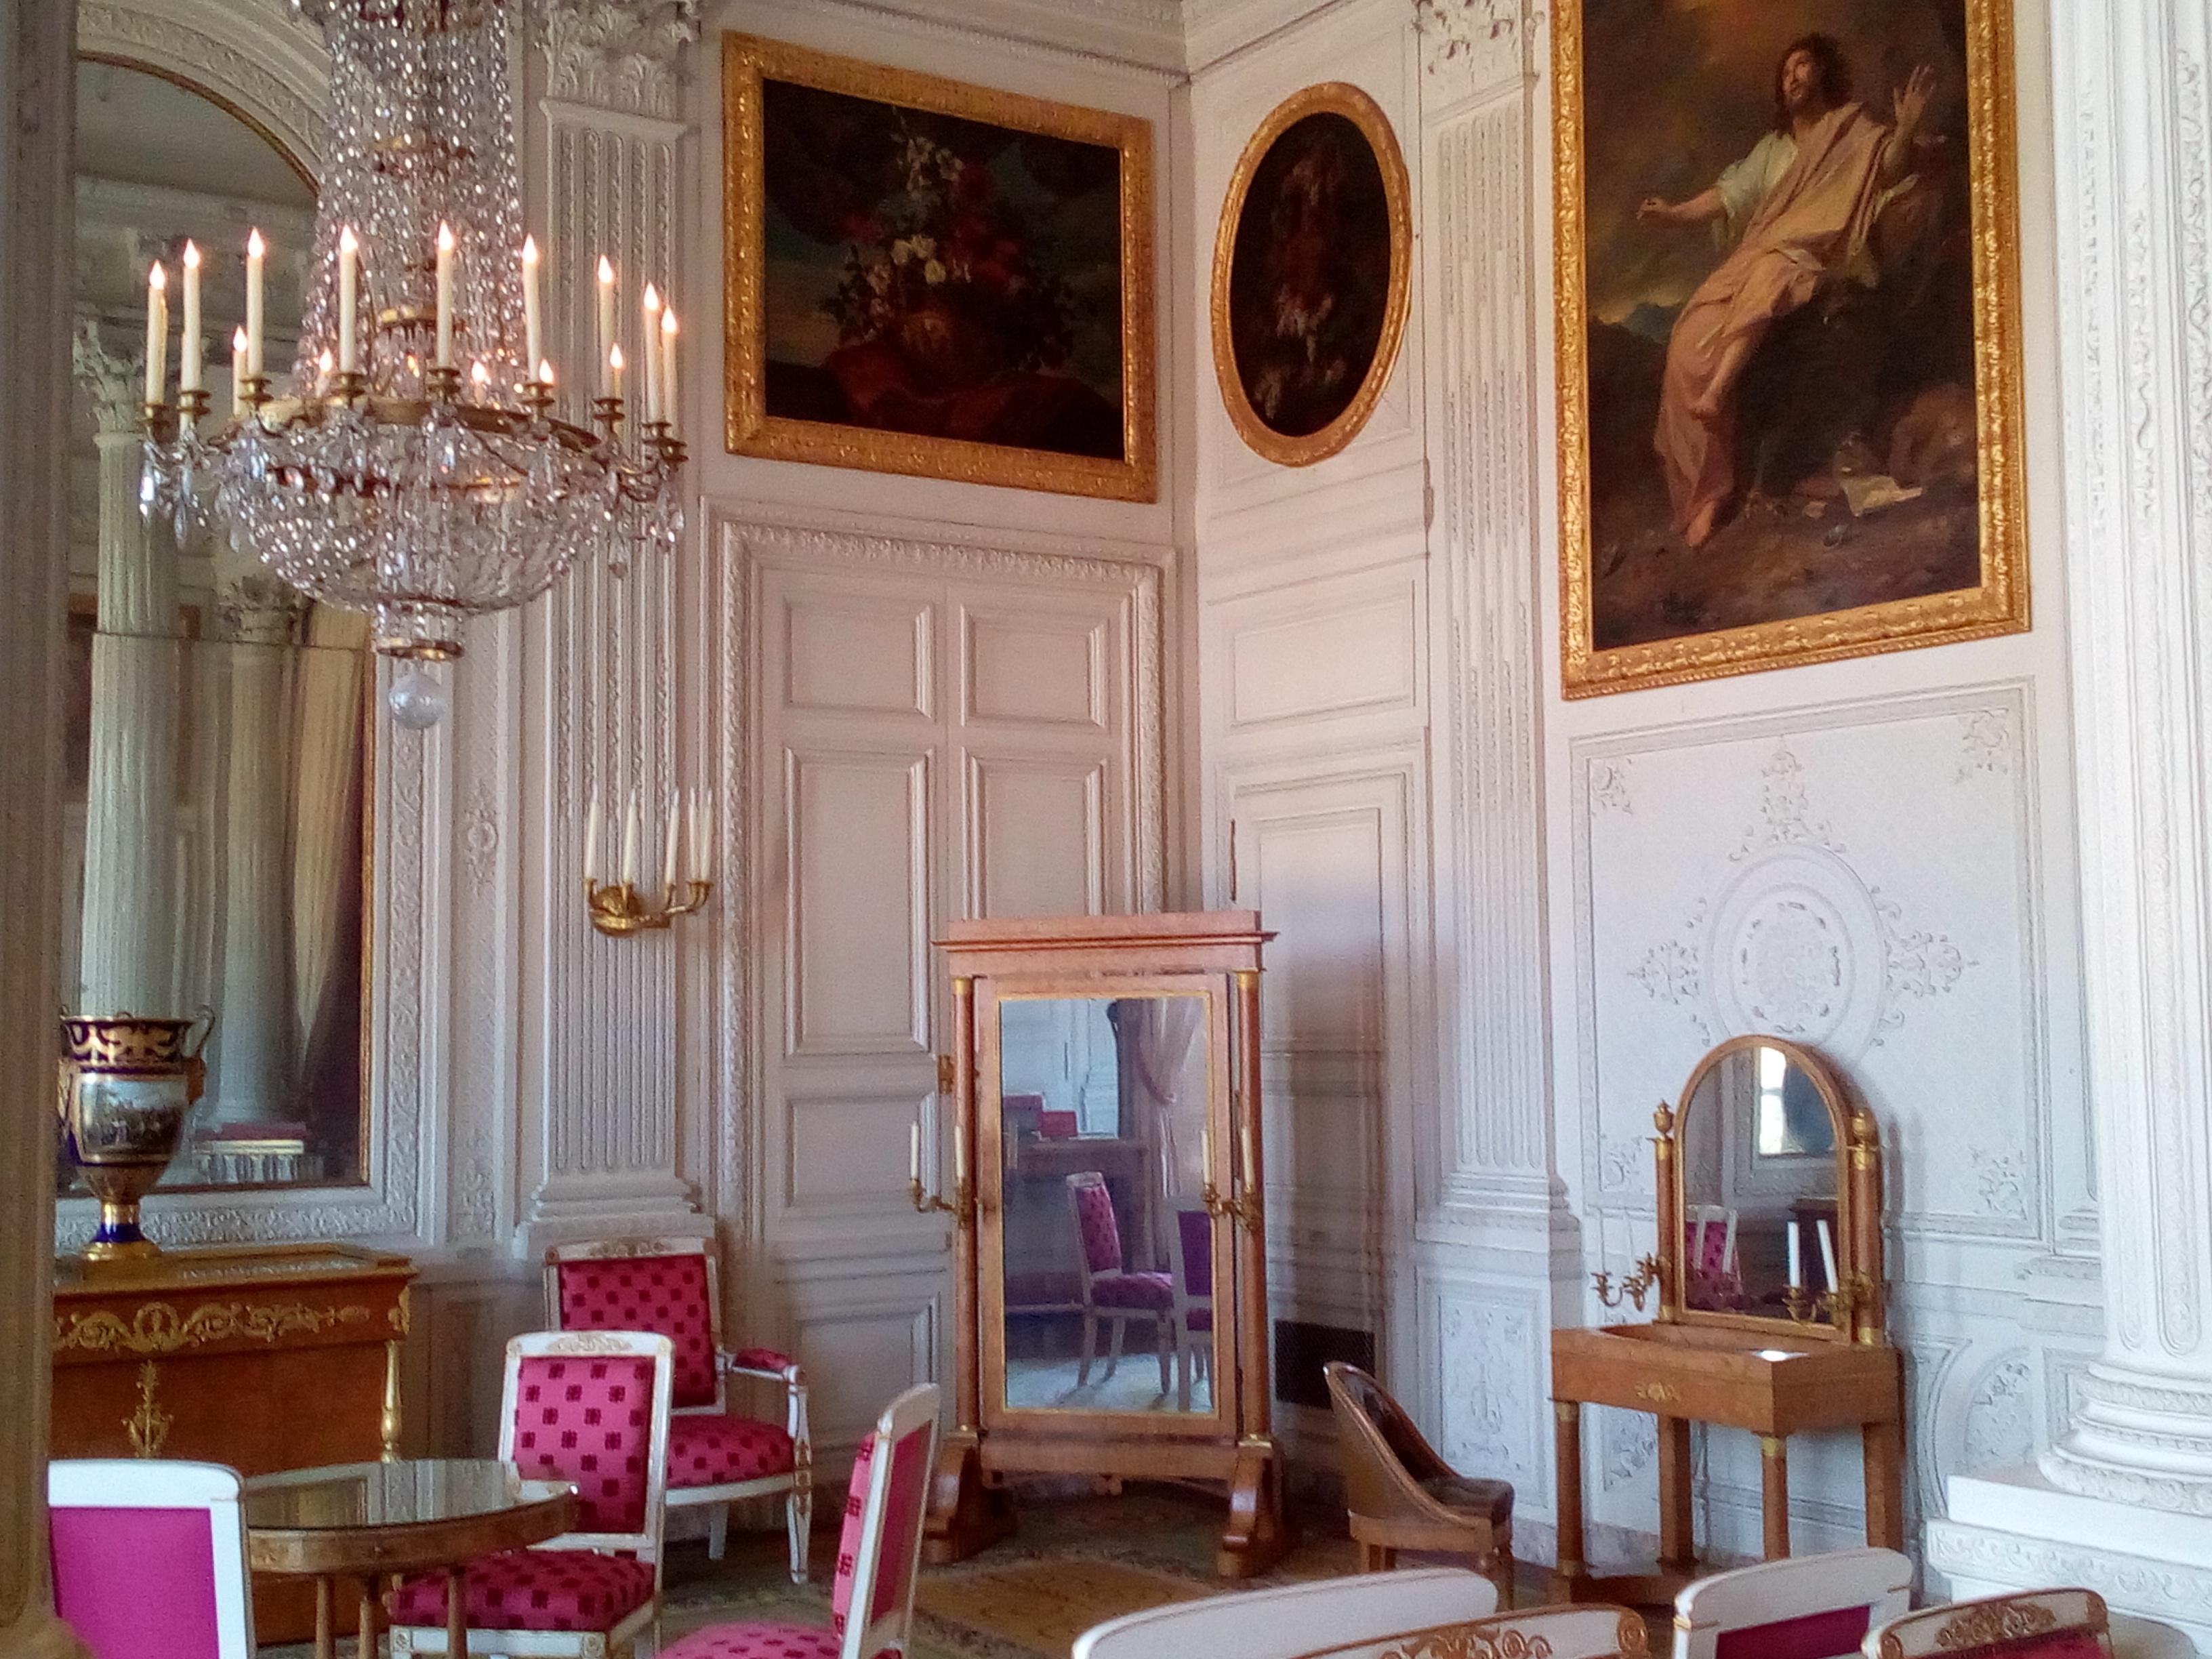 Grand Trianon, Second Salon de l'Impératrice